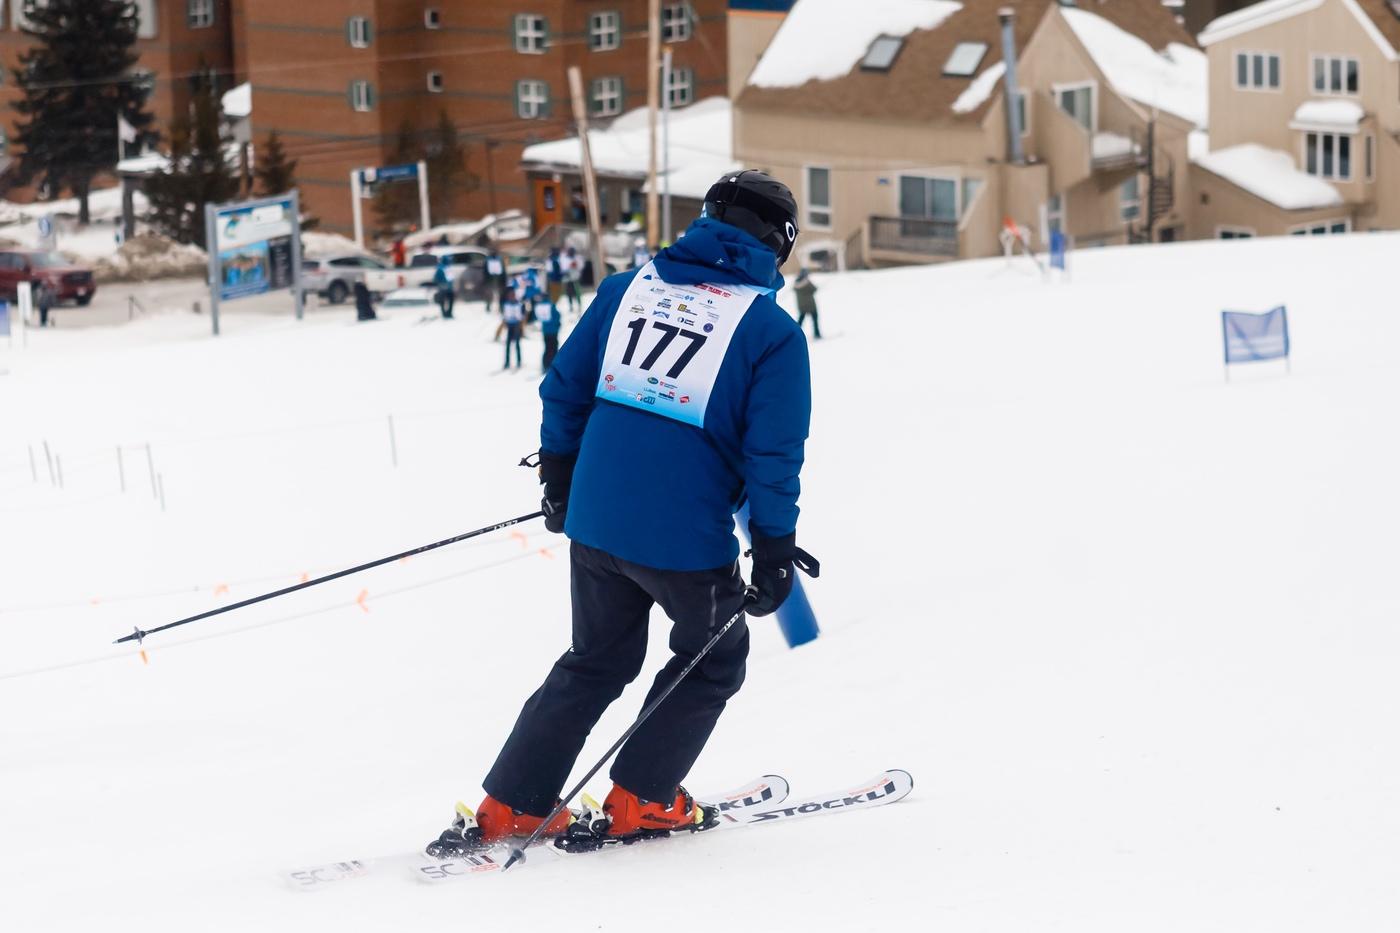 WinterKids Downhill 24 2021 SDP 2760